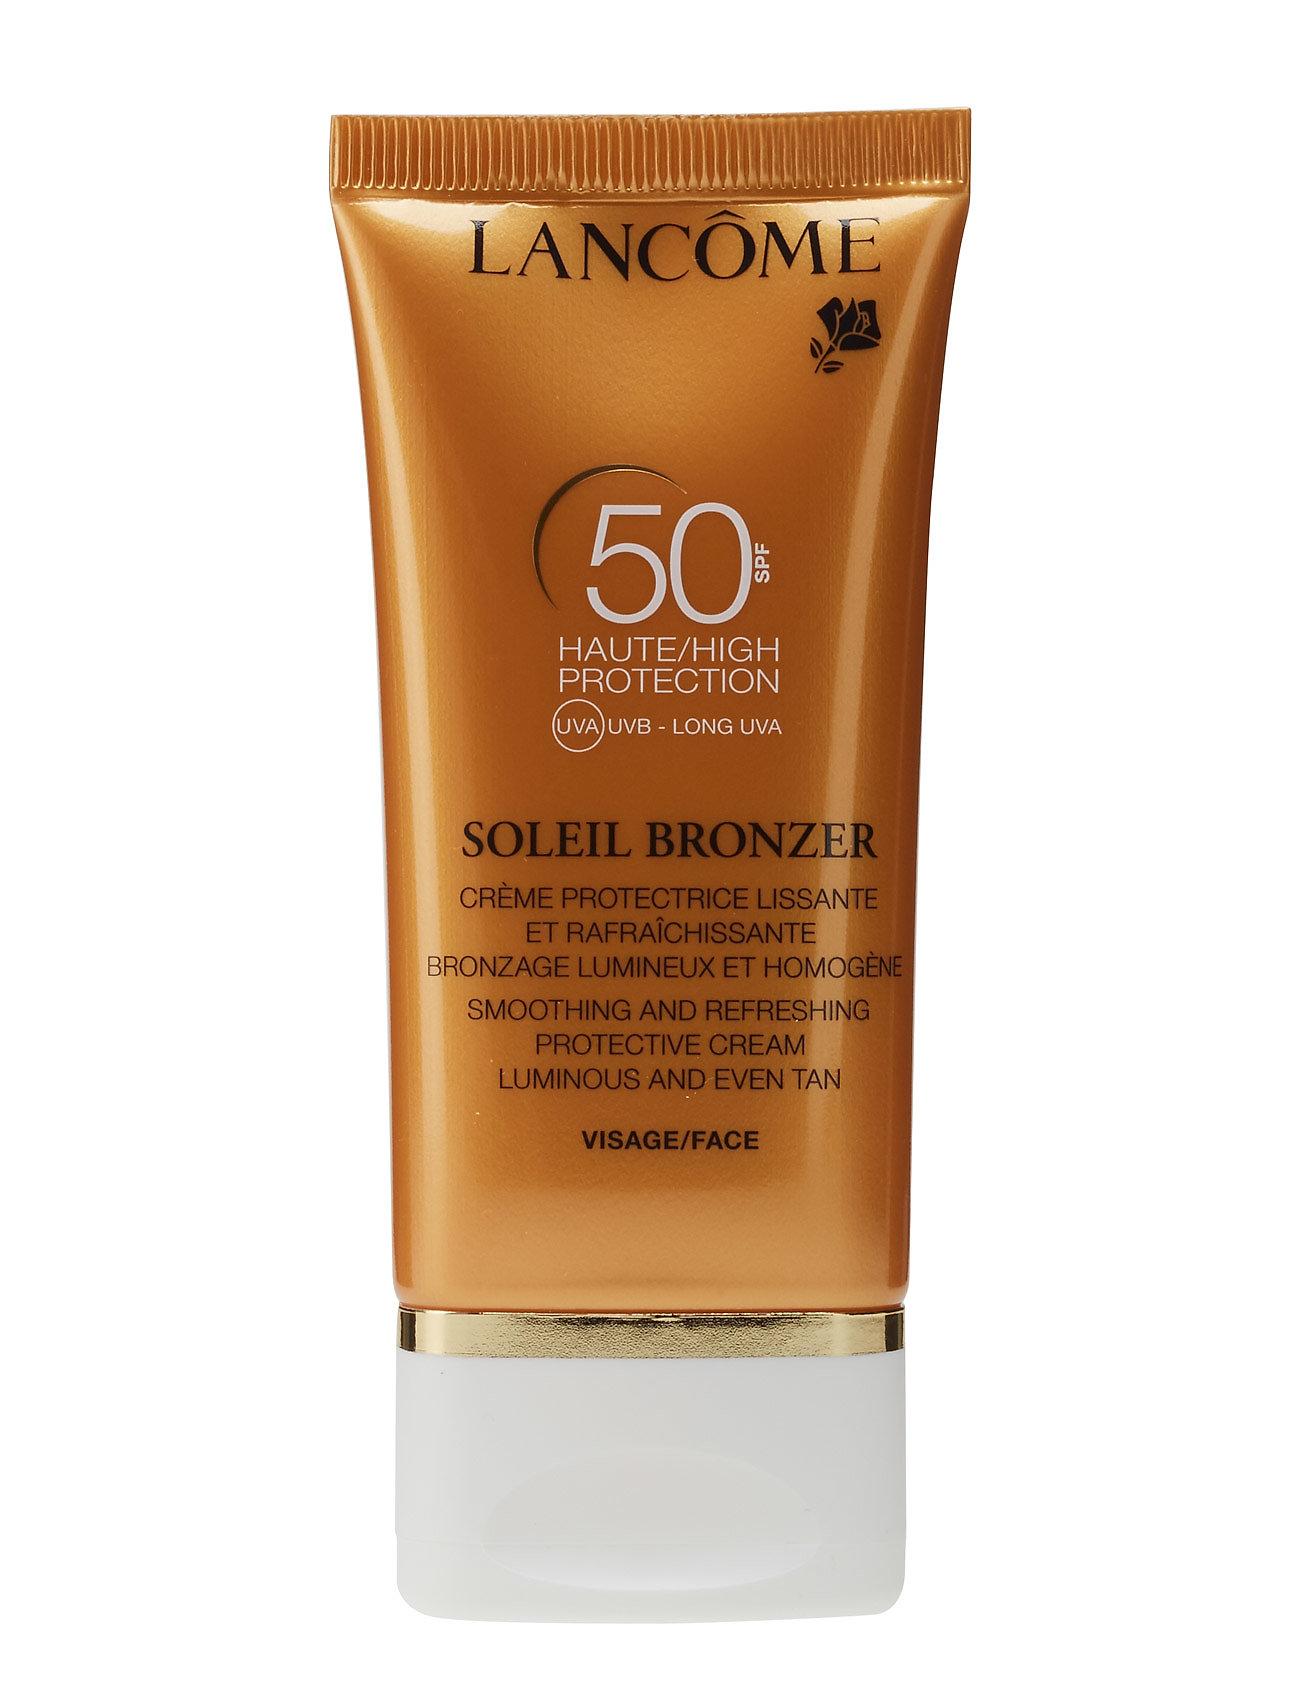 lancã´me – Soleil bronzer dry touch spf 50, 50 ml fra boozt.com dk